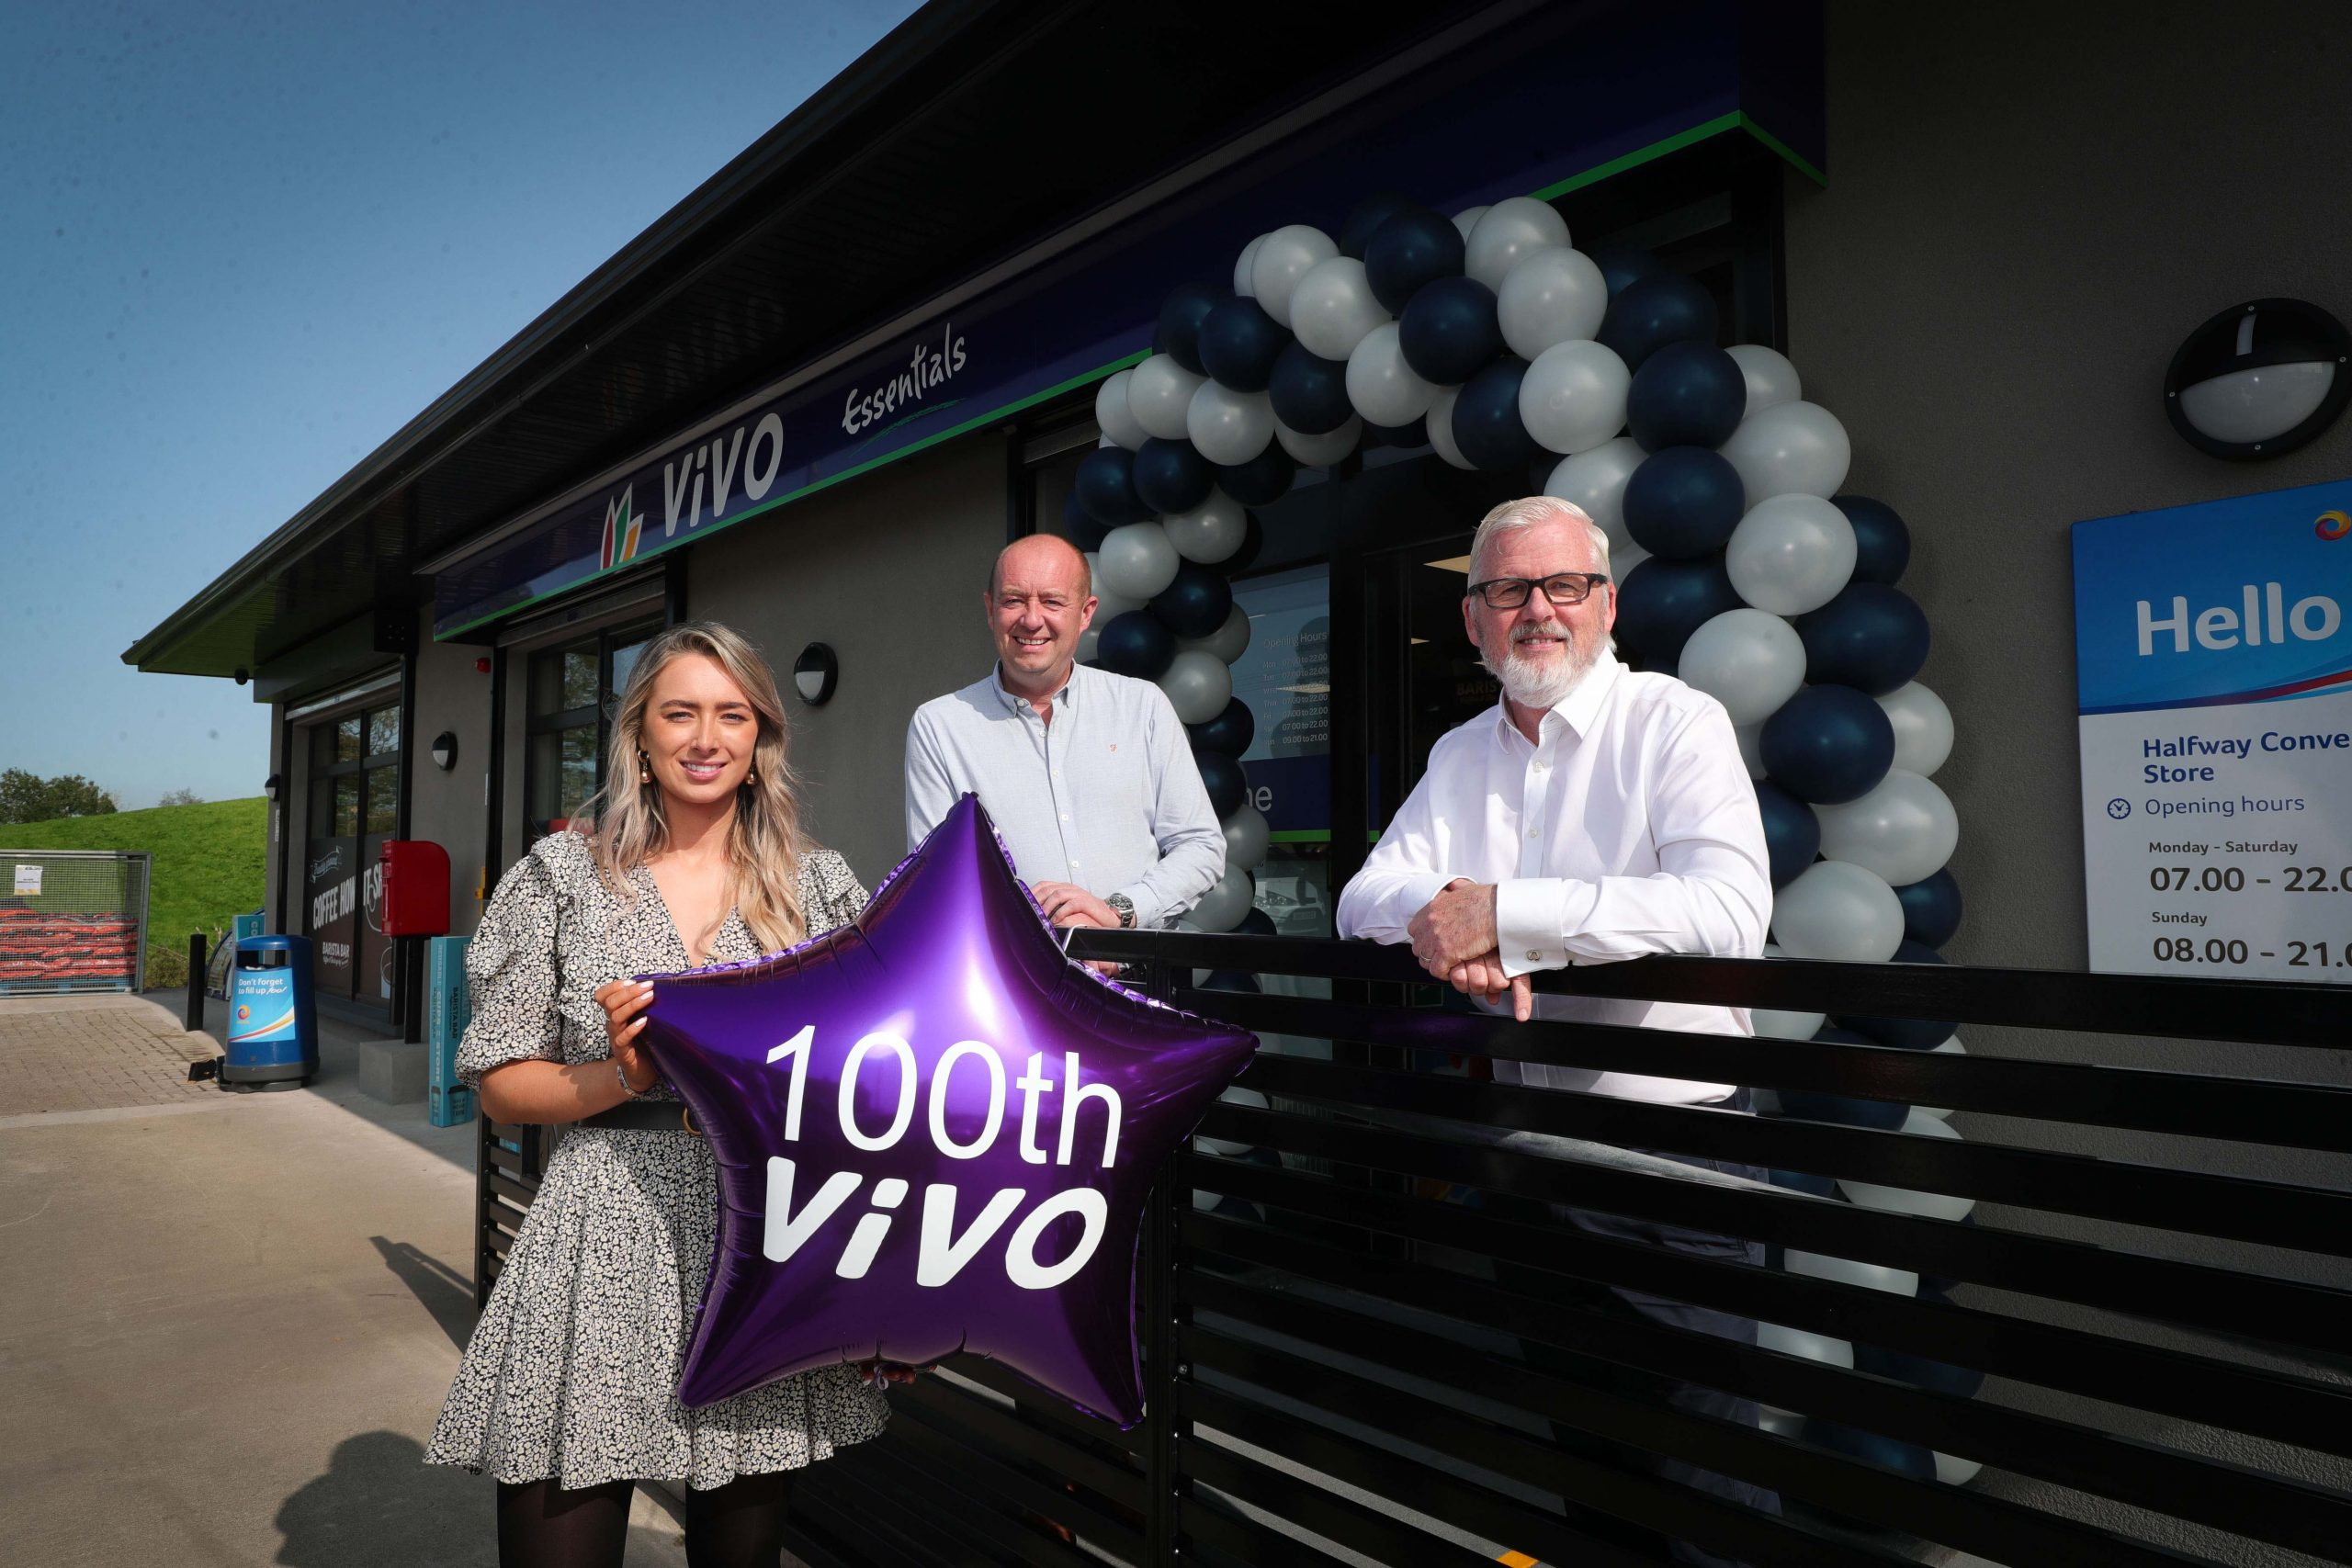 ViVO marks major milestone – one hundredth store opens in Northern Ireland